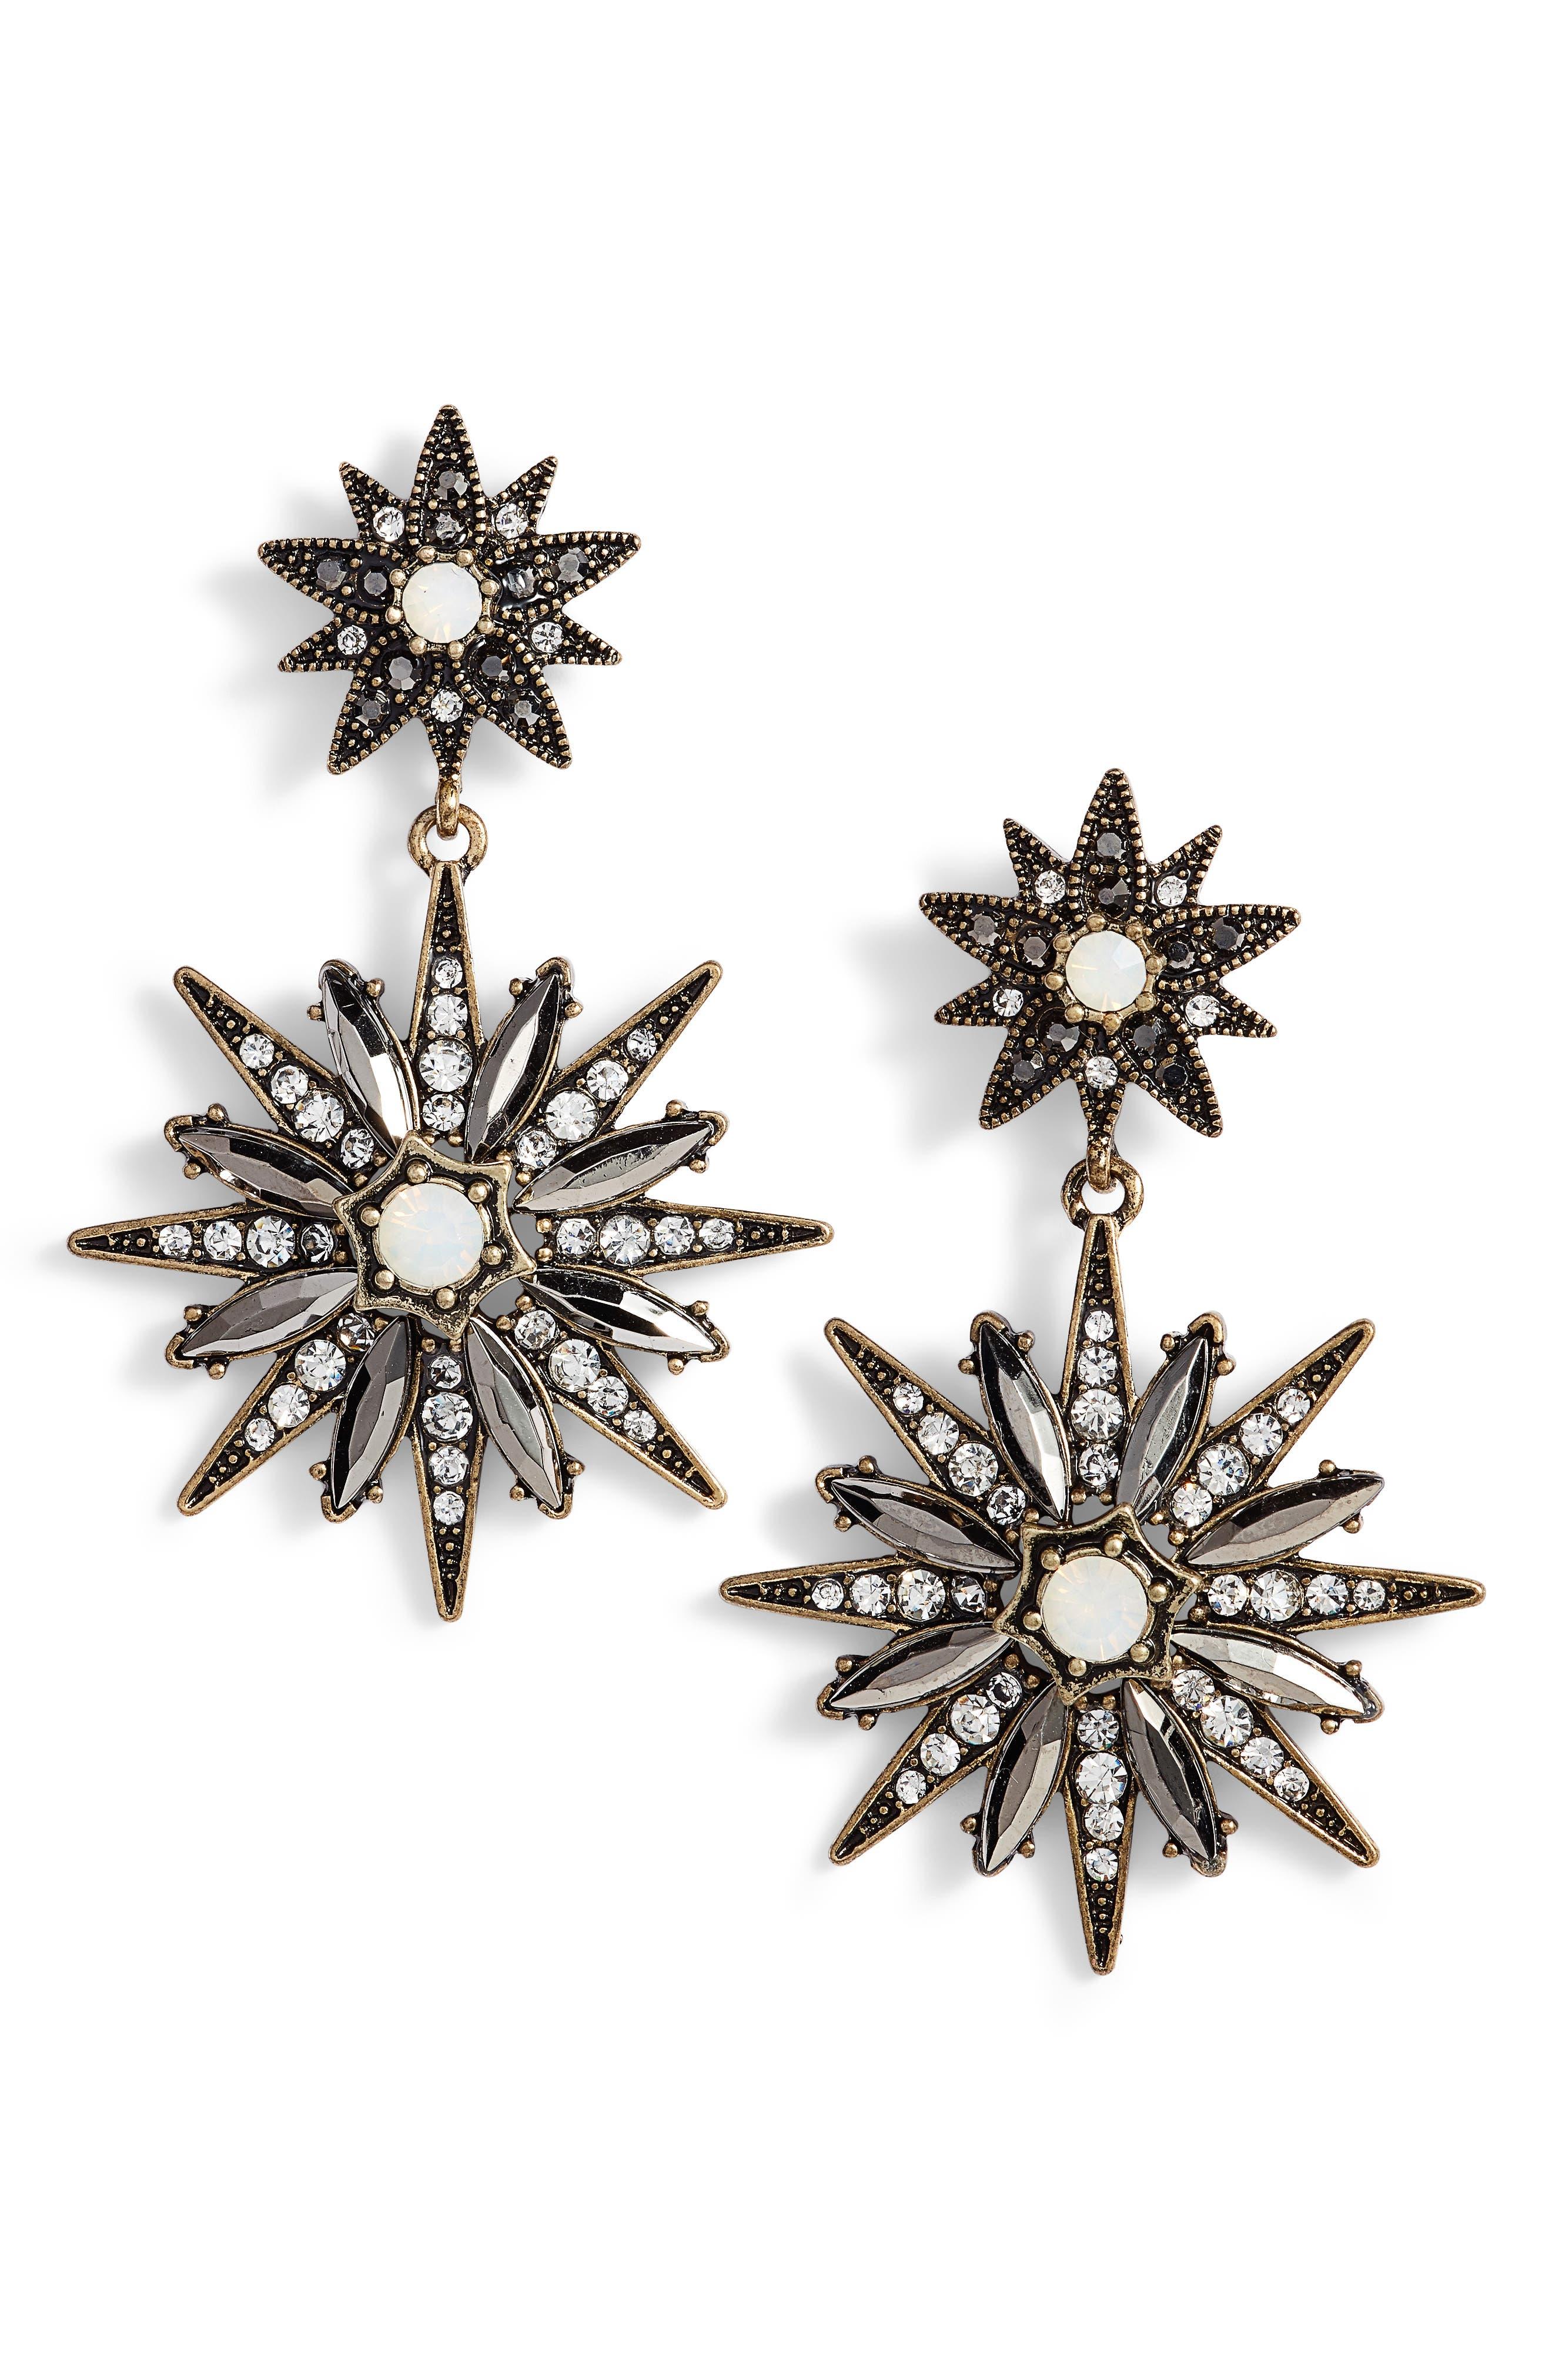 Starburst Statement Earrings,                         Main,                         color, Antique Gold/ Black